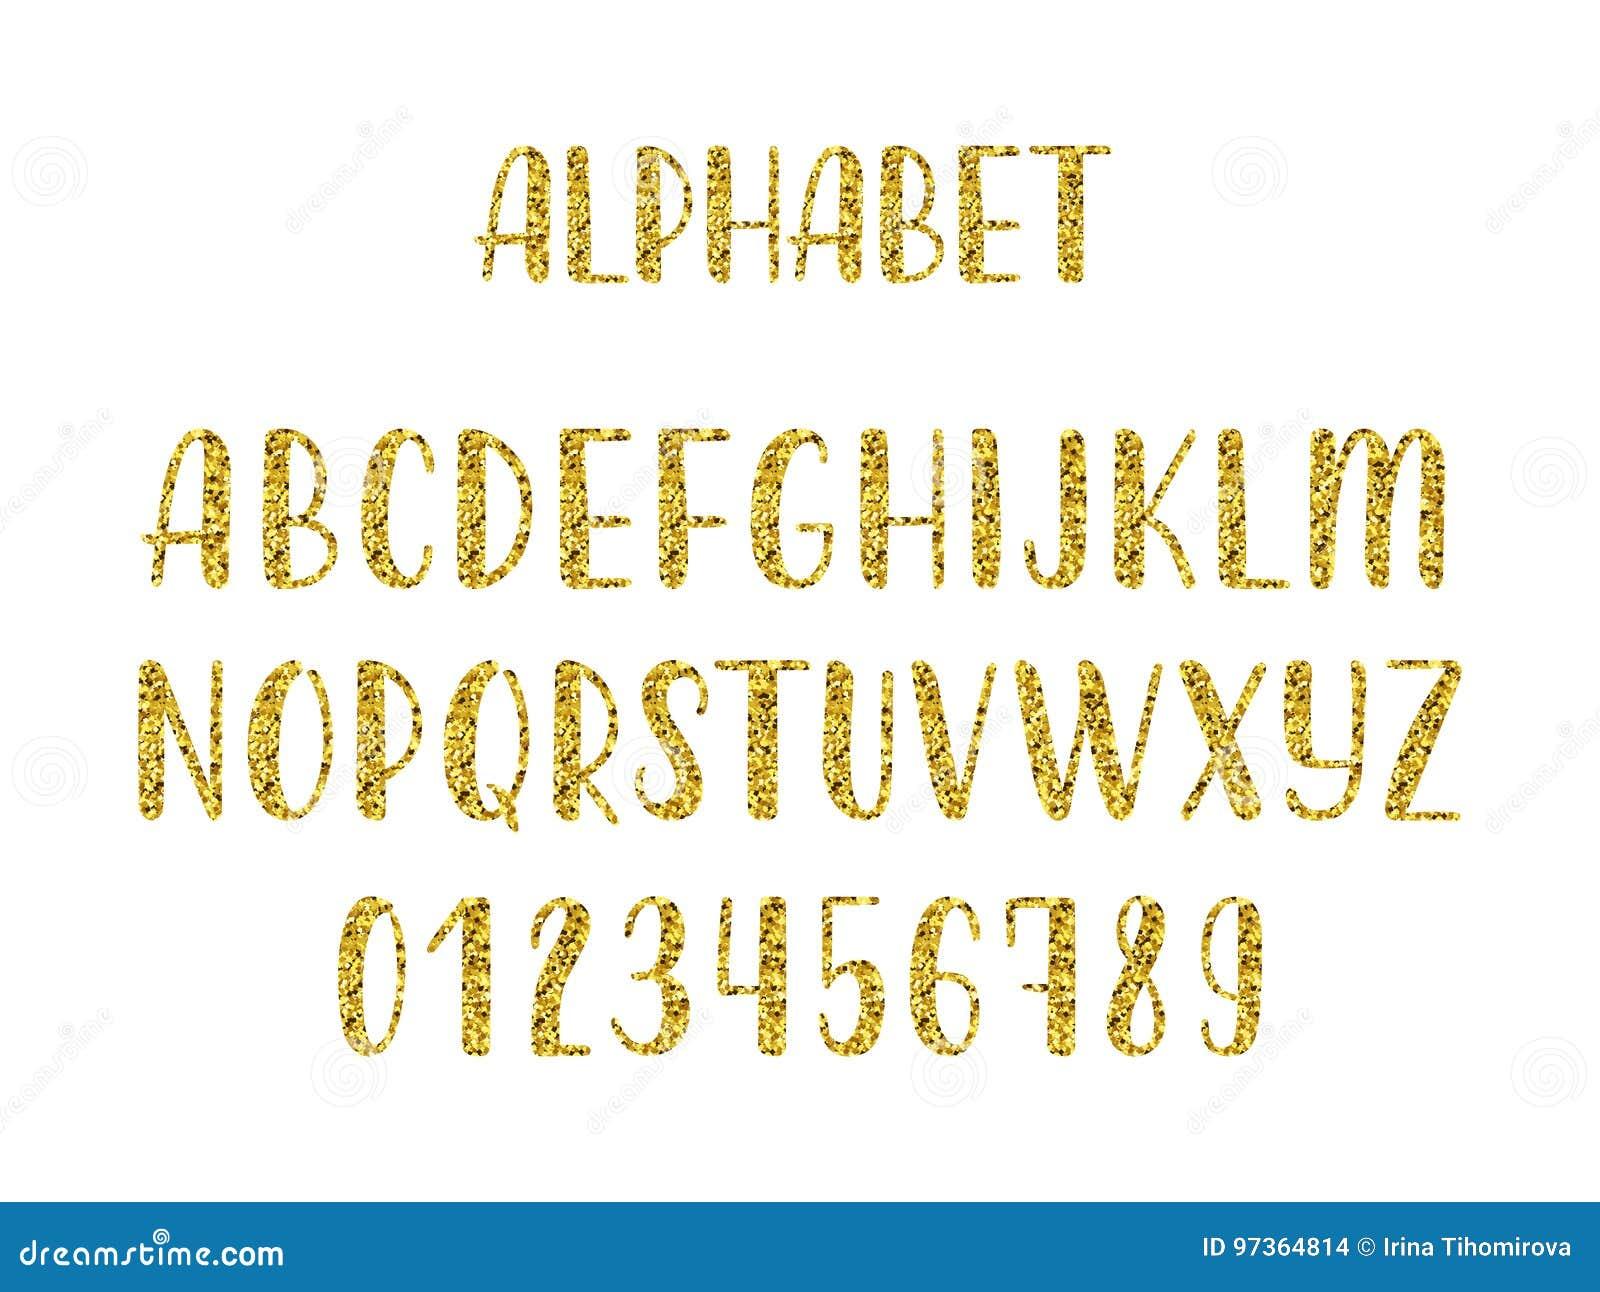 98ecbdb0159b7 Gold glitter hand drawn latin modern calligraphy brush alphabet of capital  letters. Vector